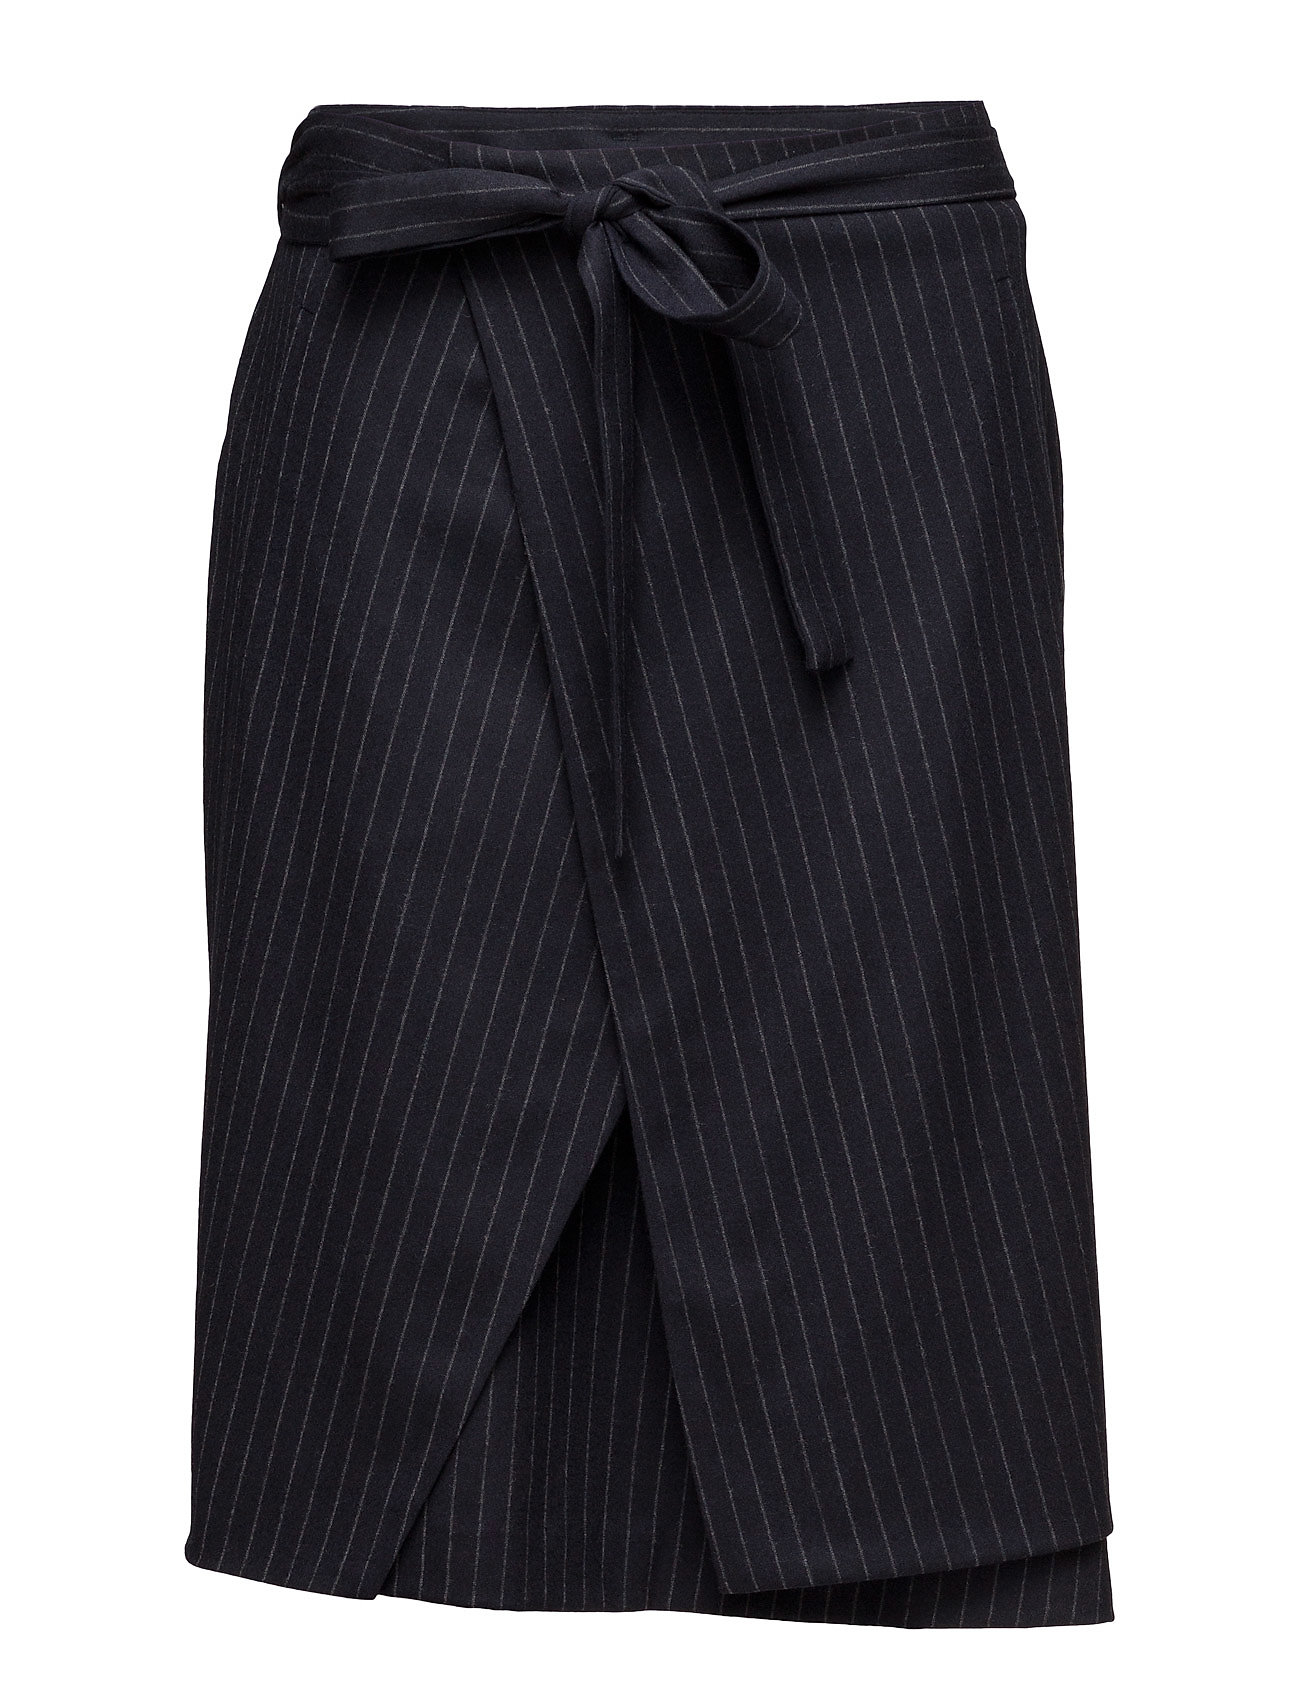 Filippa K Double Wrap Skirt